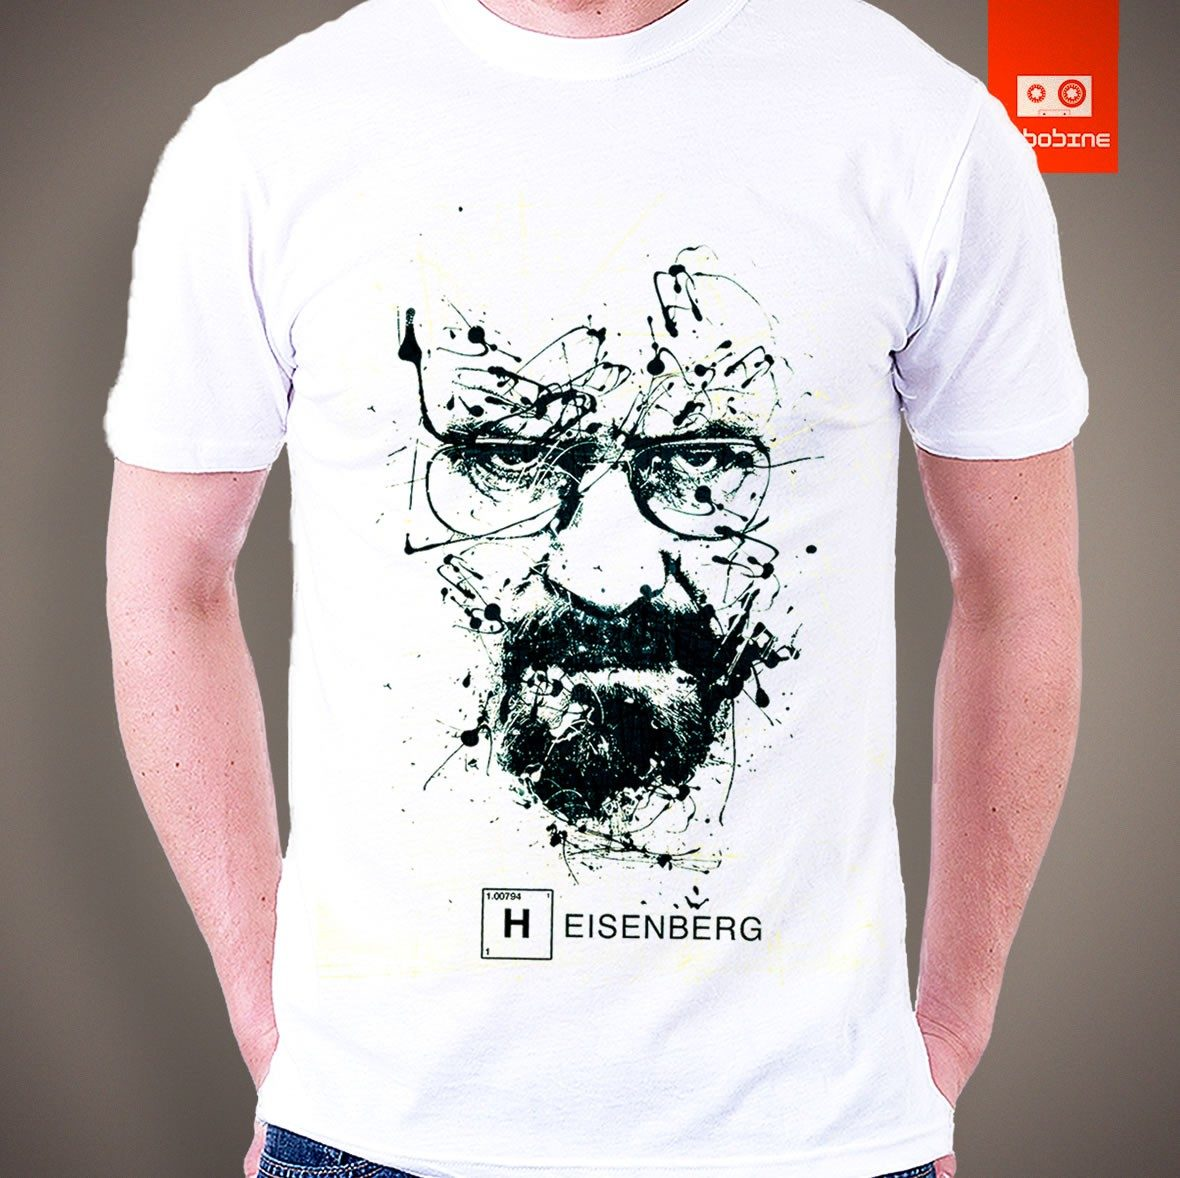 0a5d2b928 camiseta breaking bad walter white tv e seriados puzzle. Carregando zoom.